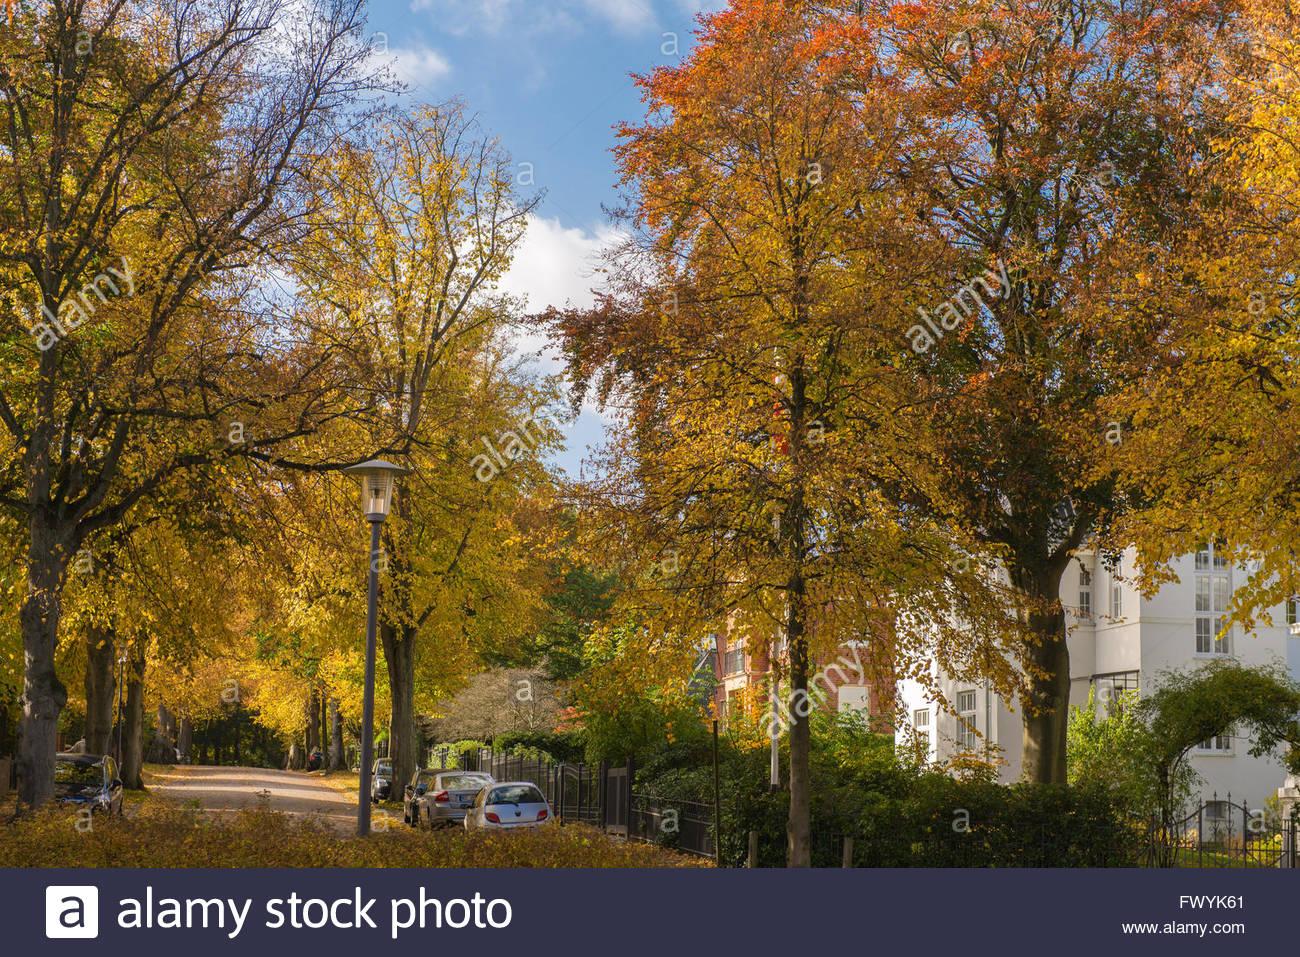 Bismarckallee, Kiel, Schleswig-Holstein, Germany - Stock Image